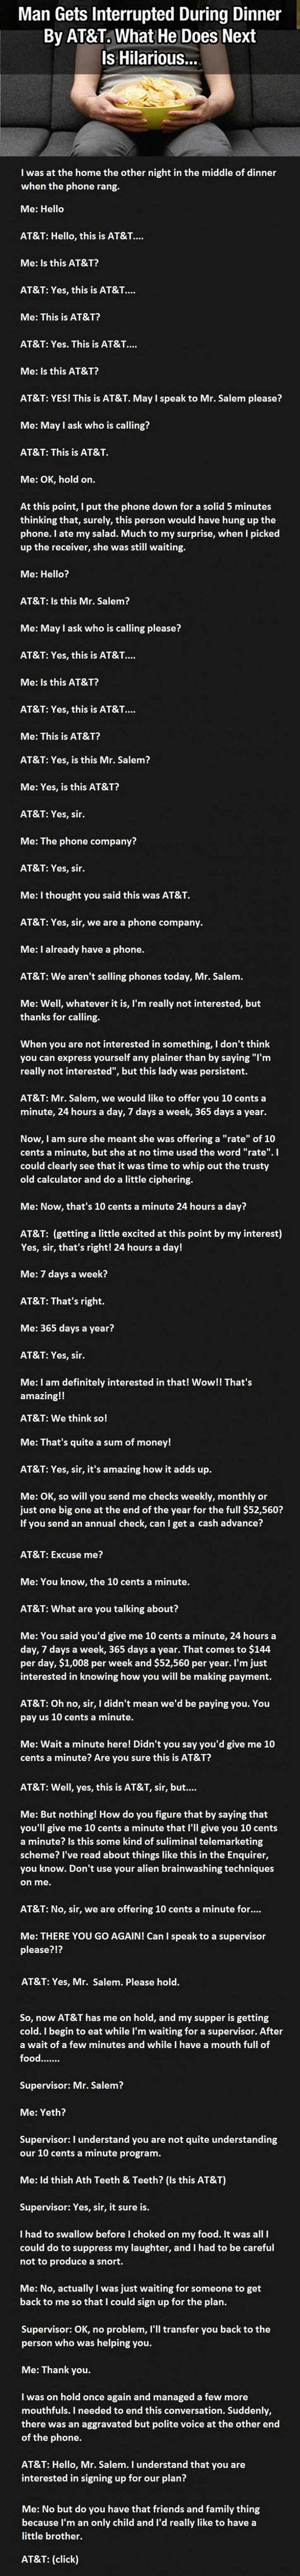 Funny Conversation #Conversation, #Funny